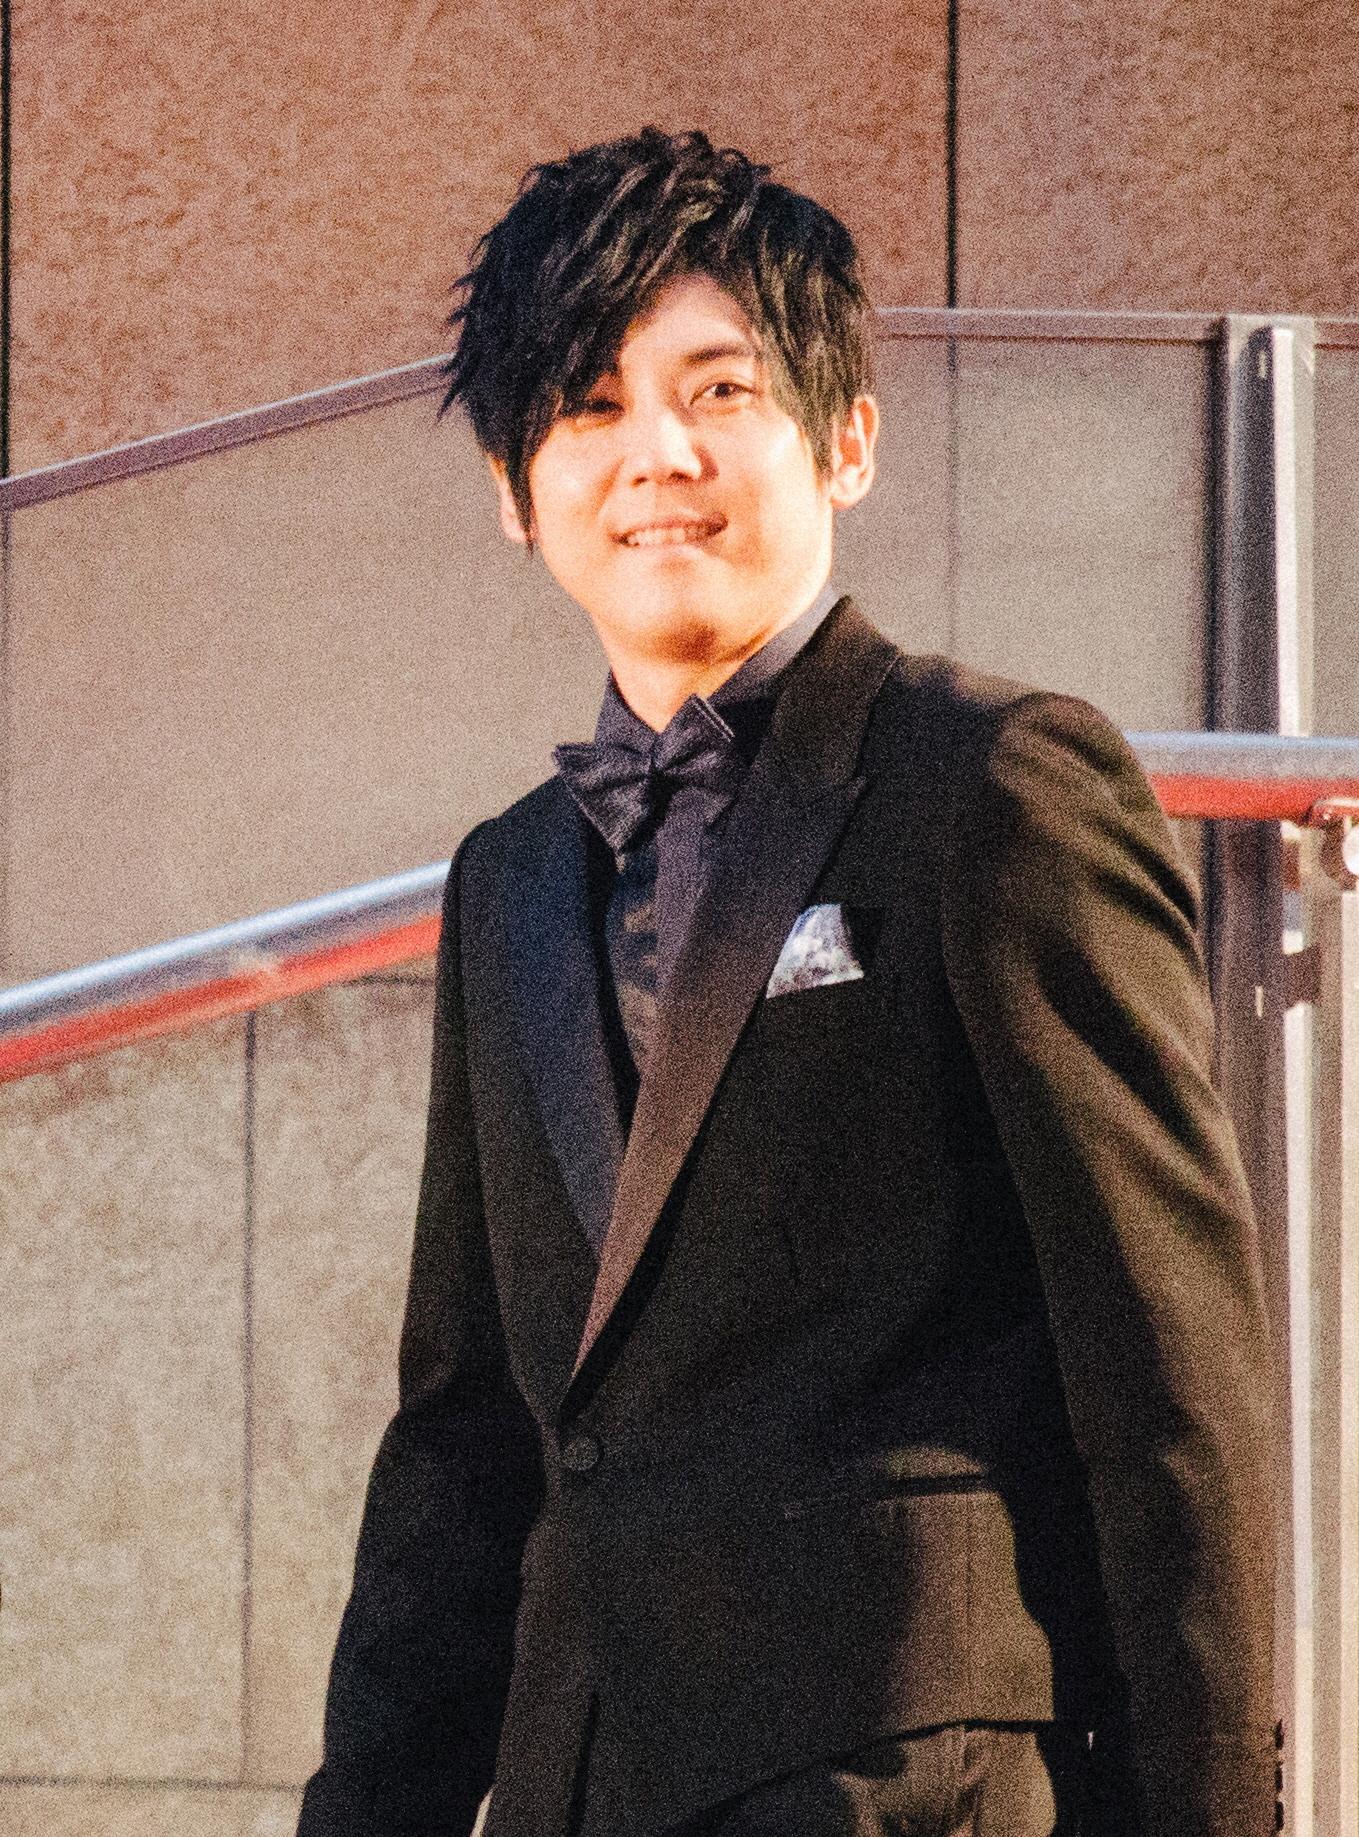 Totalling 10 team ups / collaborations across various titles *. Yuki Kaji Wikipedia